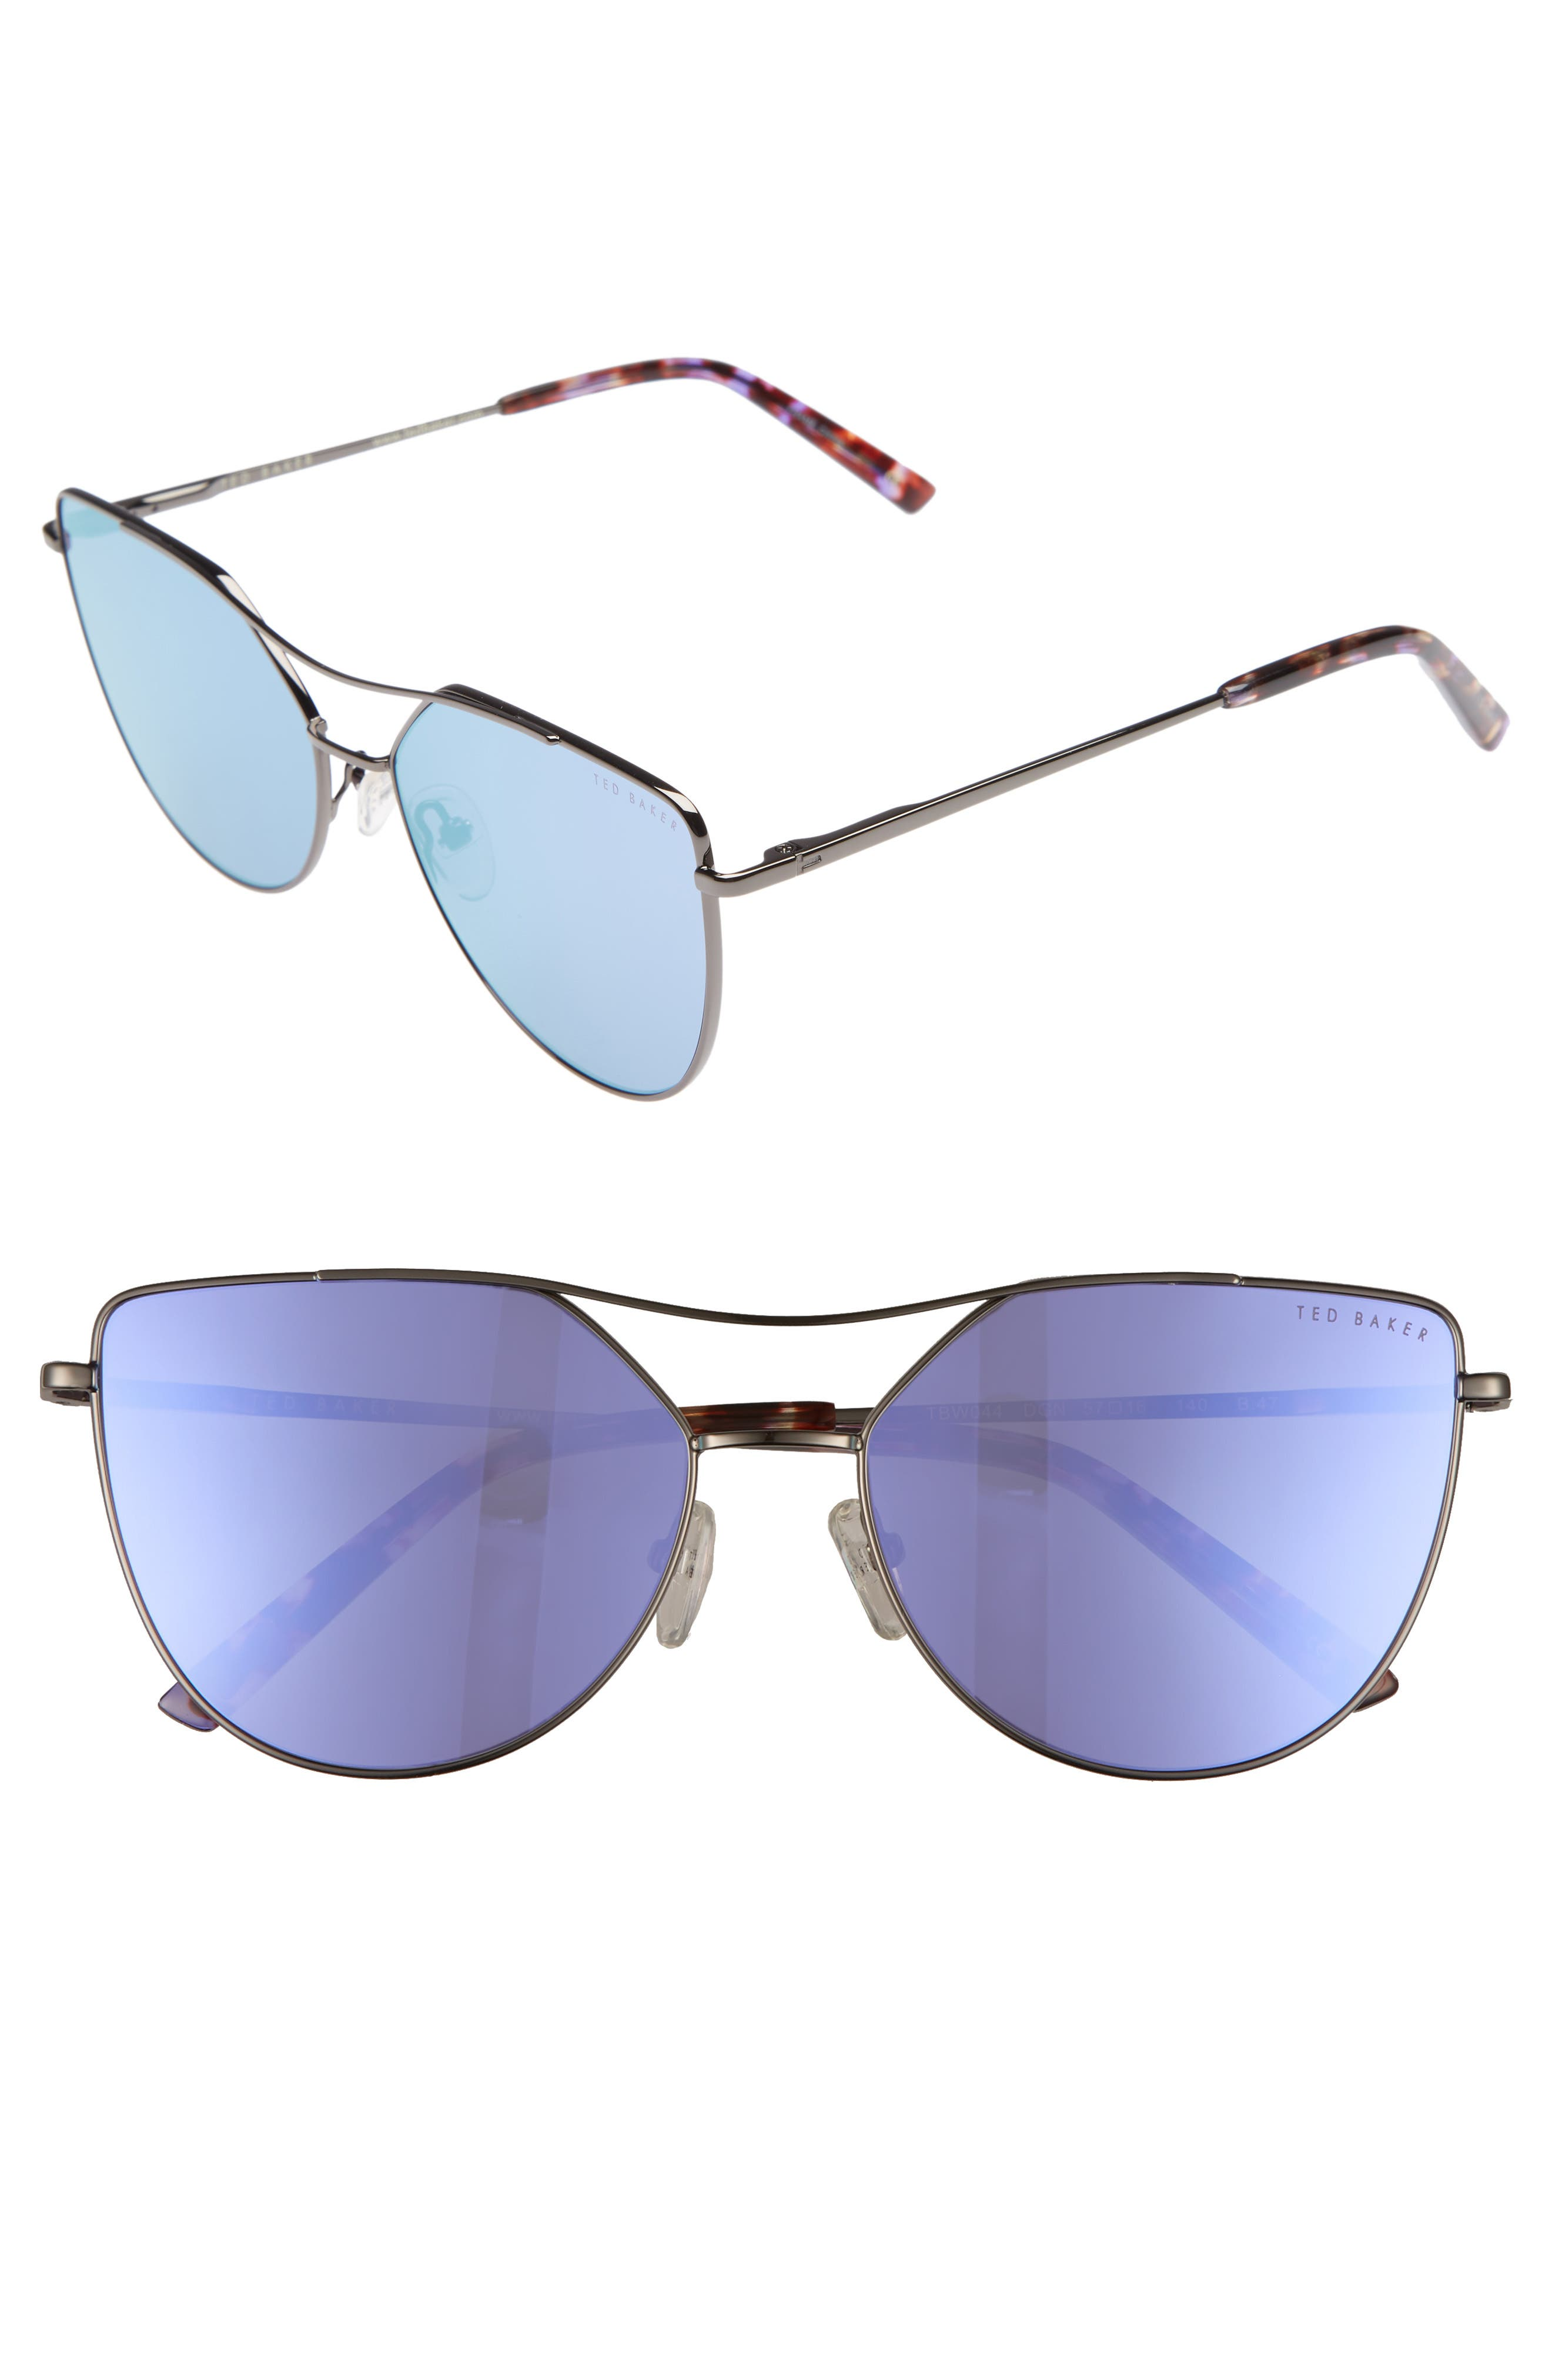 57mm Geometric Aviator Sunglasses,                             Main thumbnail 1, color,                             Dark Gunmetal